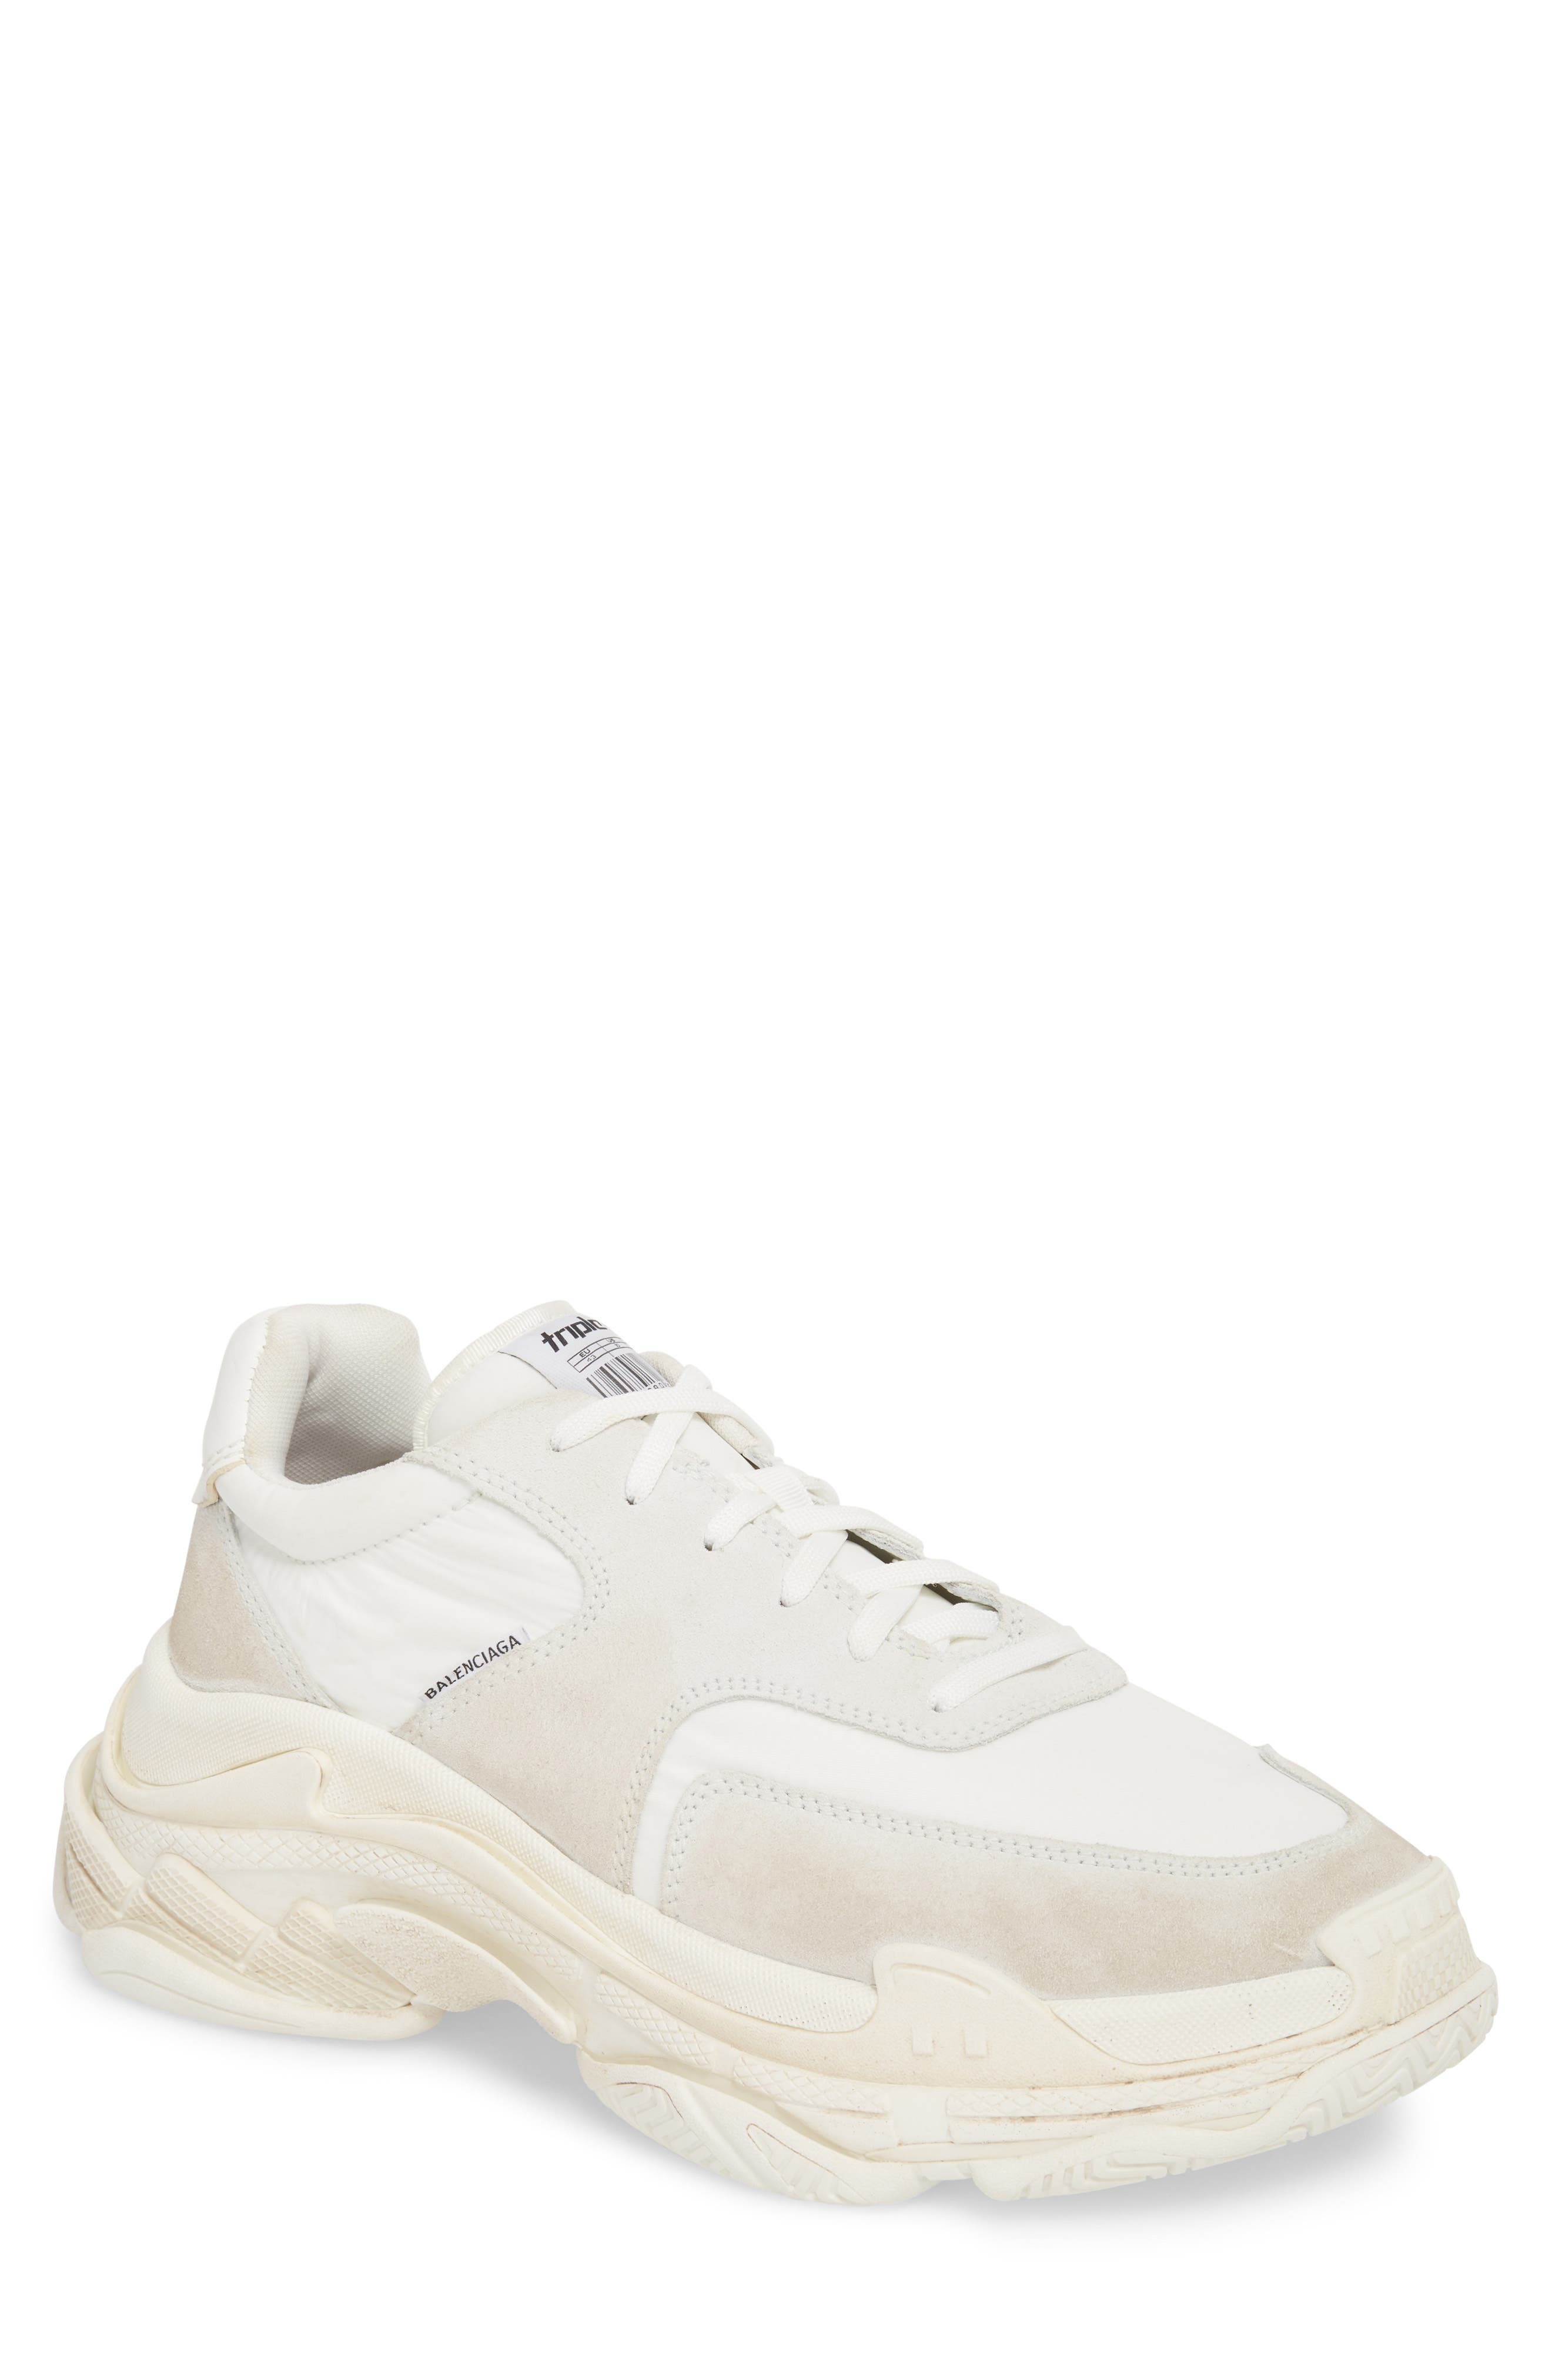 Triple S Retro Sneaker,                             Main thumbnail 1, color,                             Blanc White